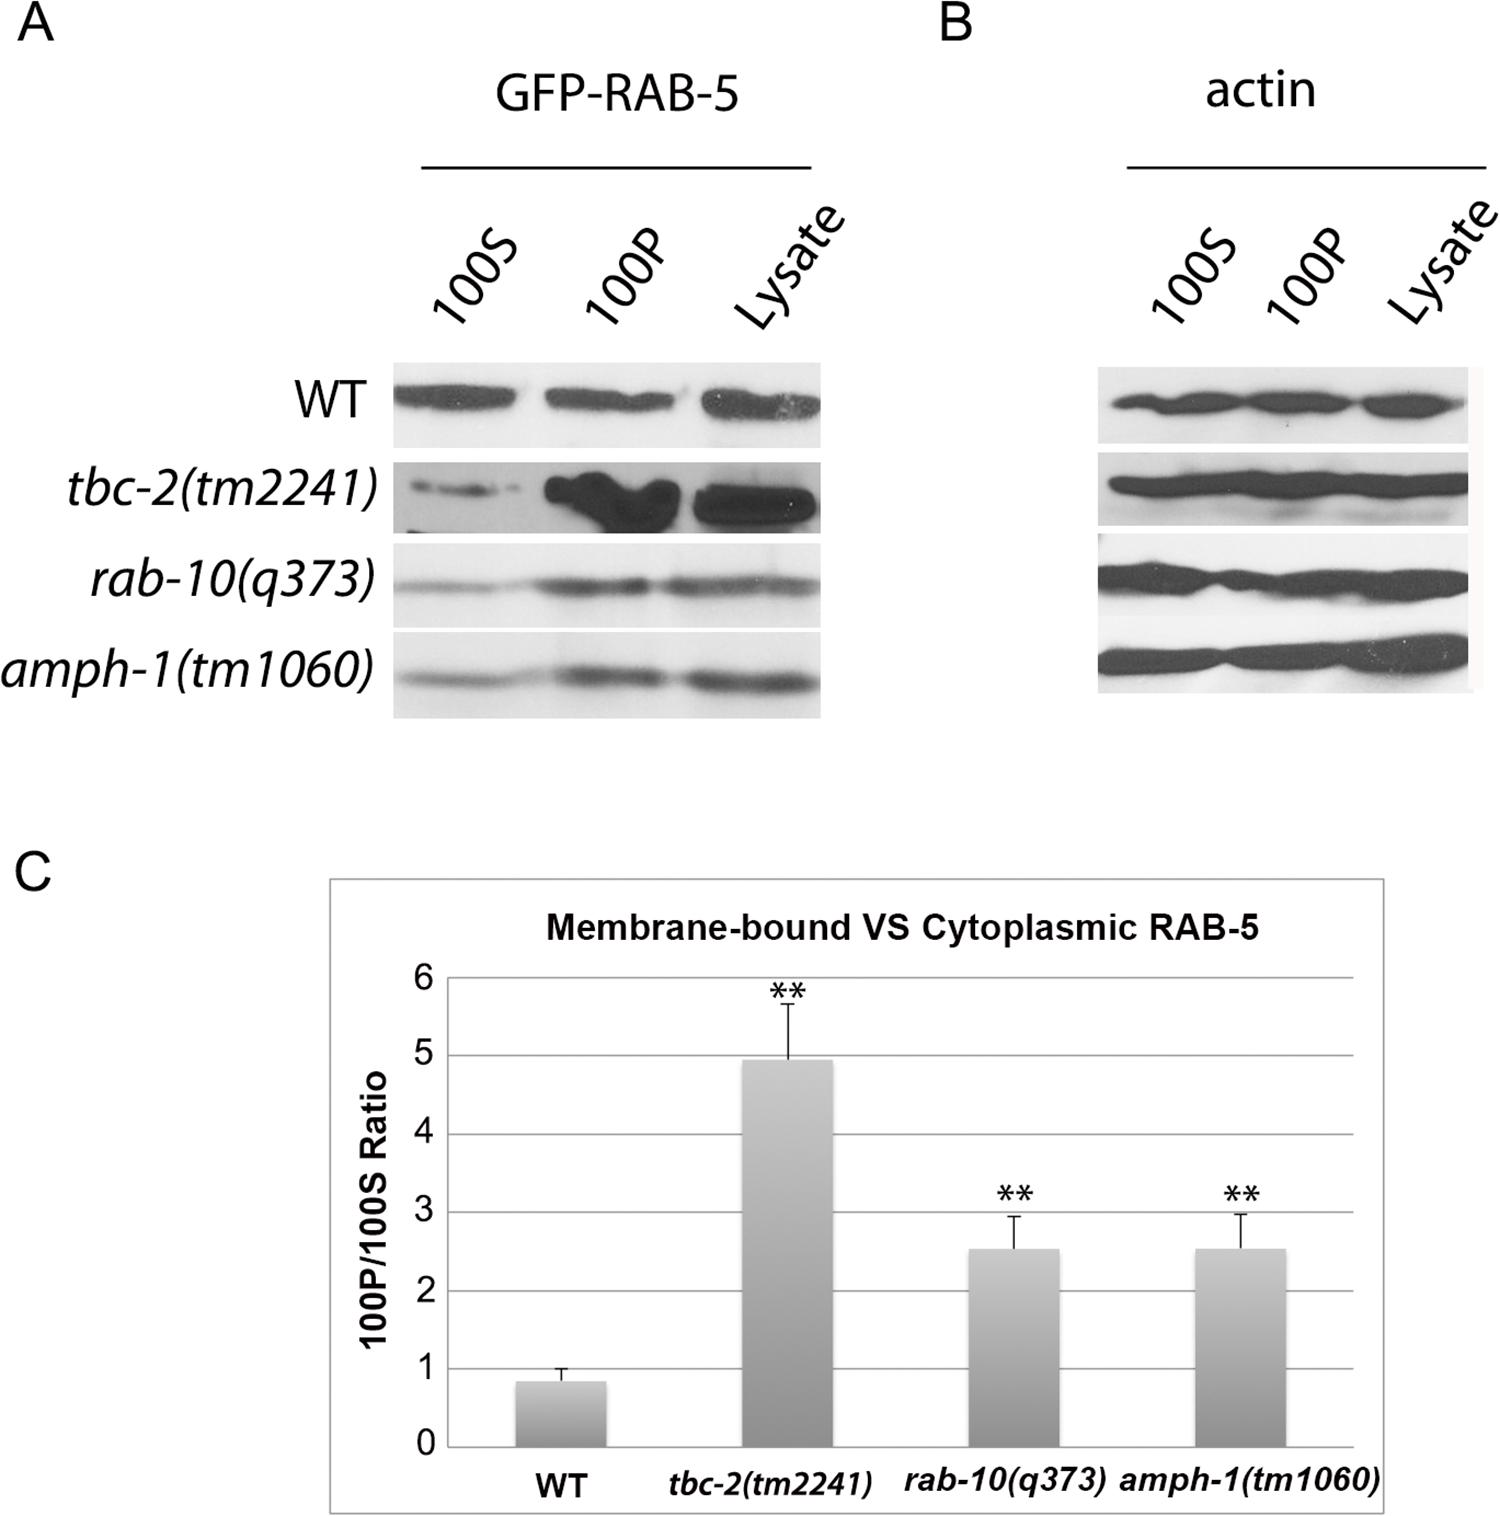 RAB-5 displays elevated membrane-association in <i>tbc-2</i>, <i>rab-10</i> and <i>amph-1</i> mutants.